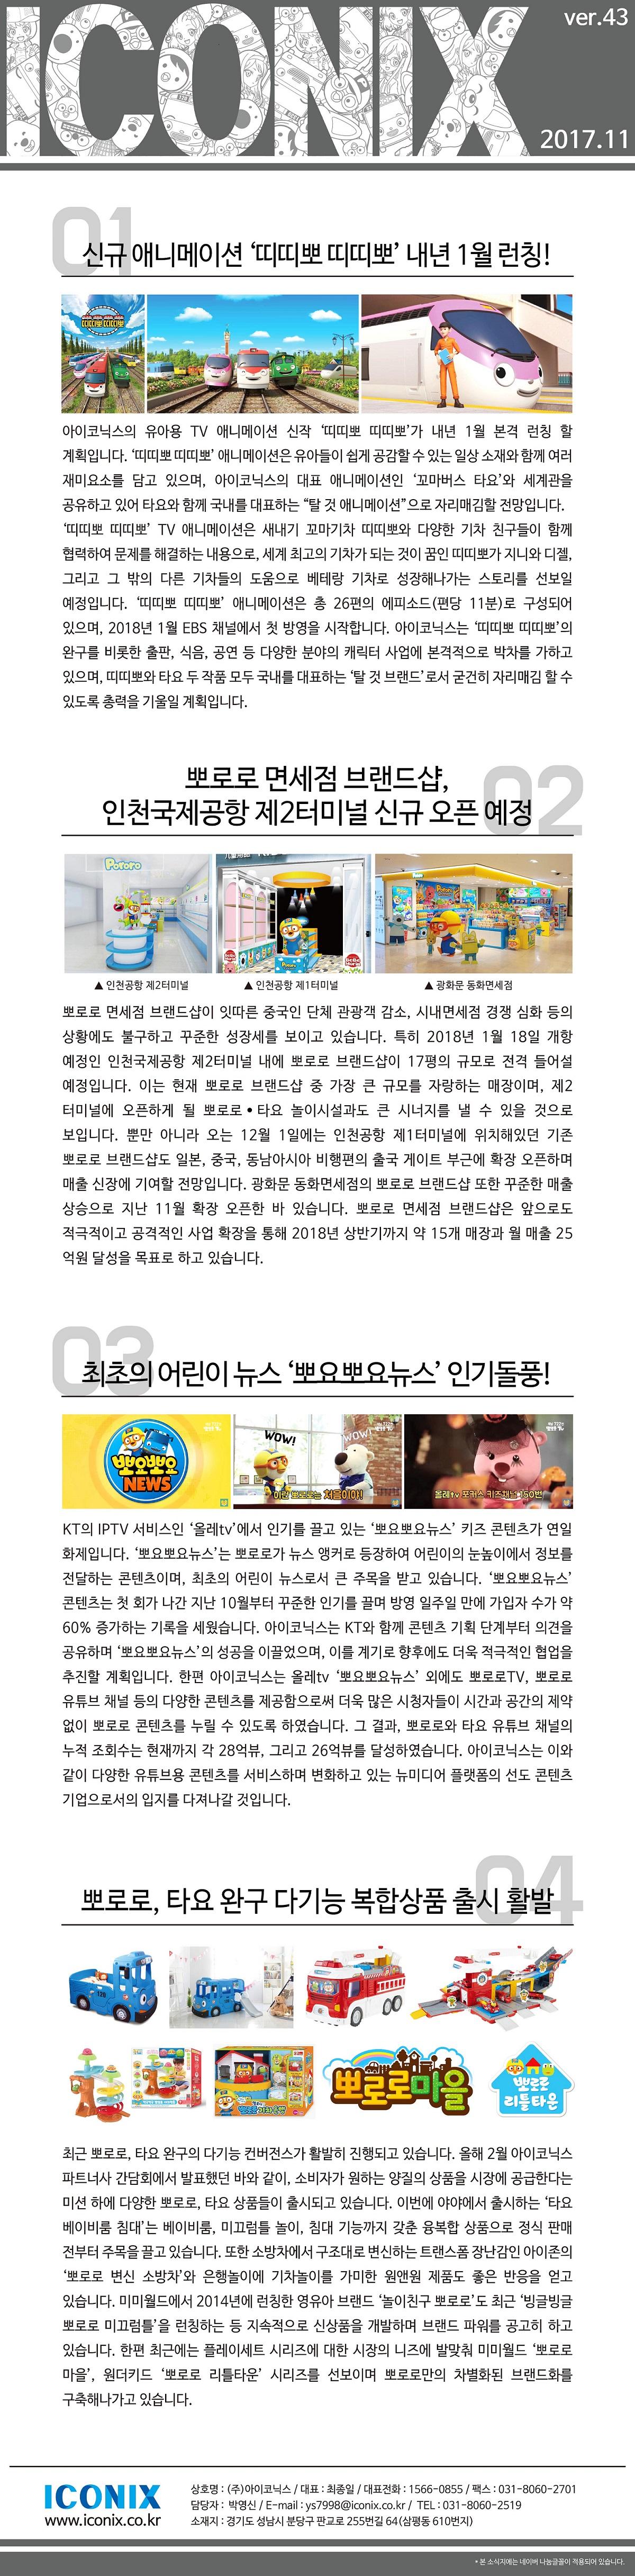 ICONIX_News Letter_1711_저용량.jpg